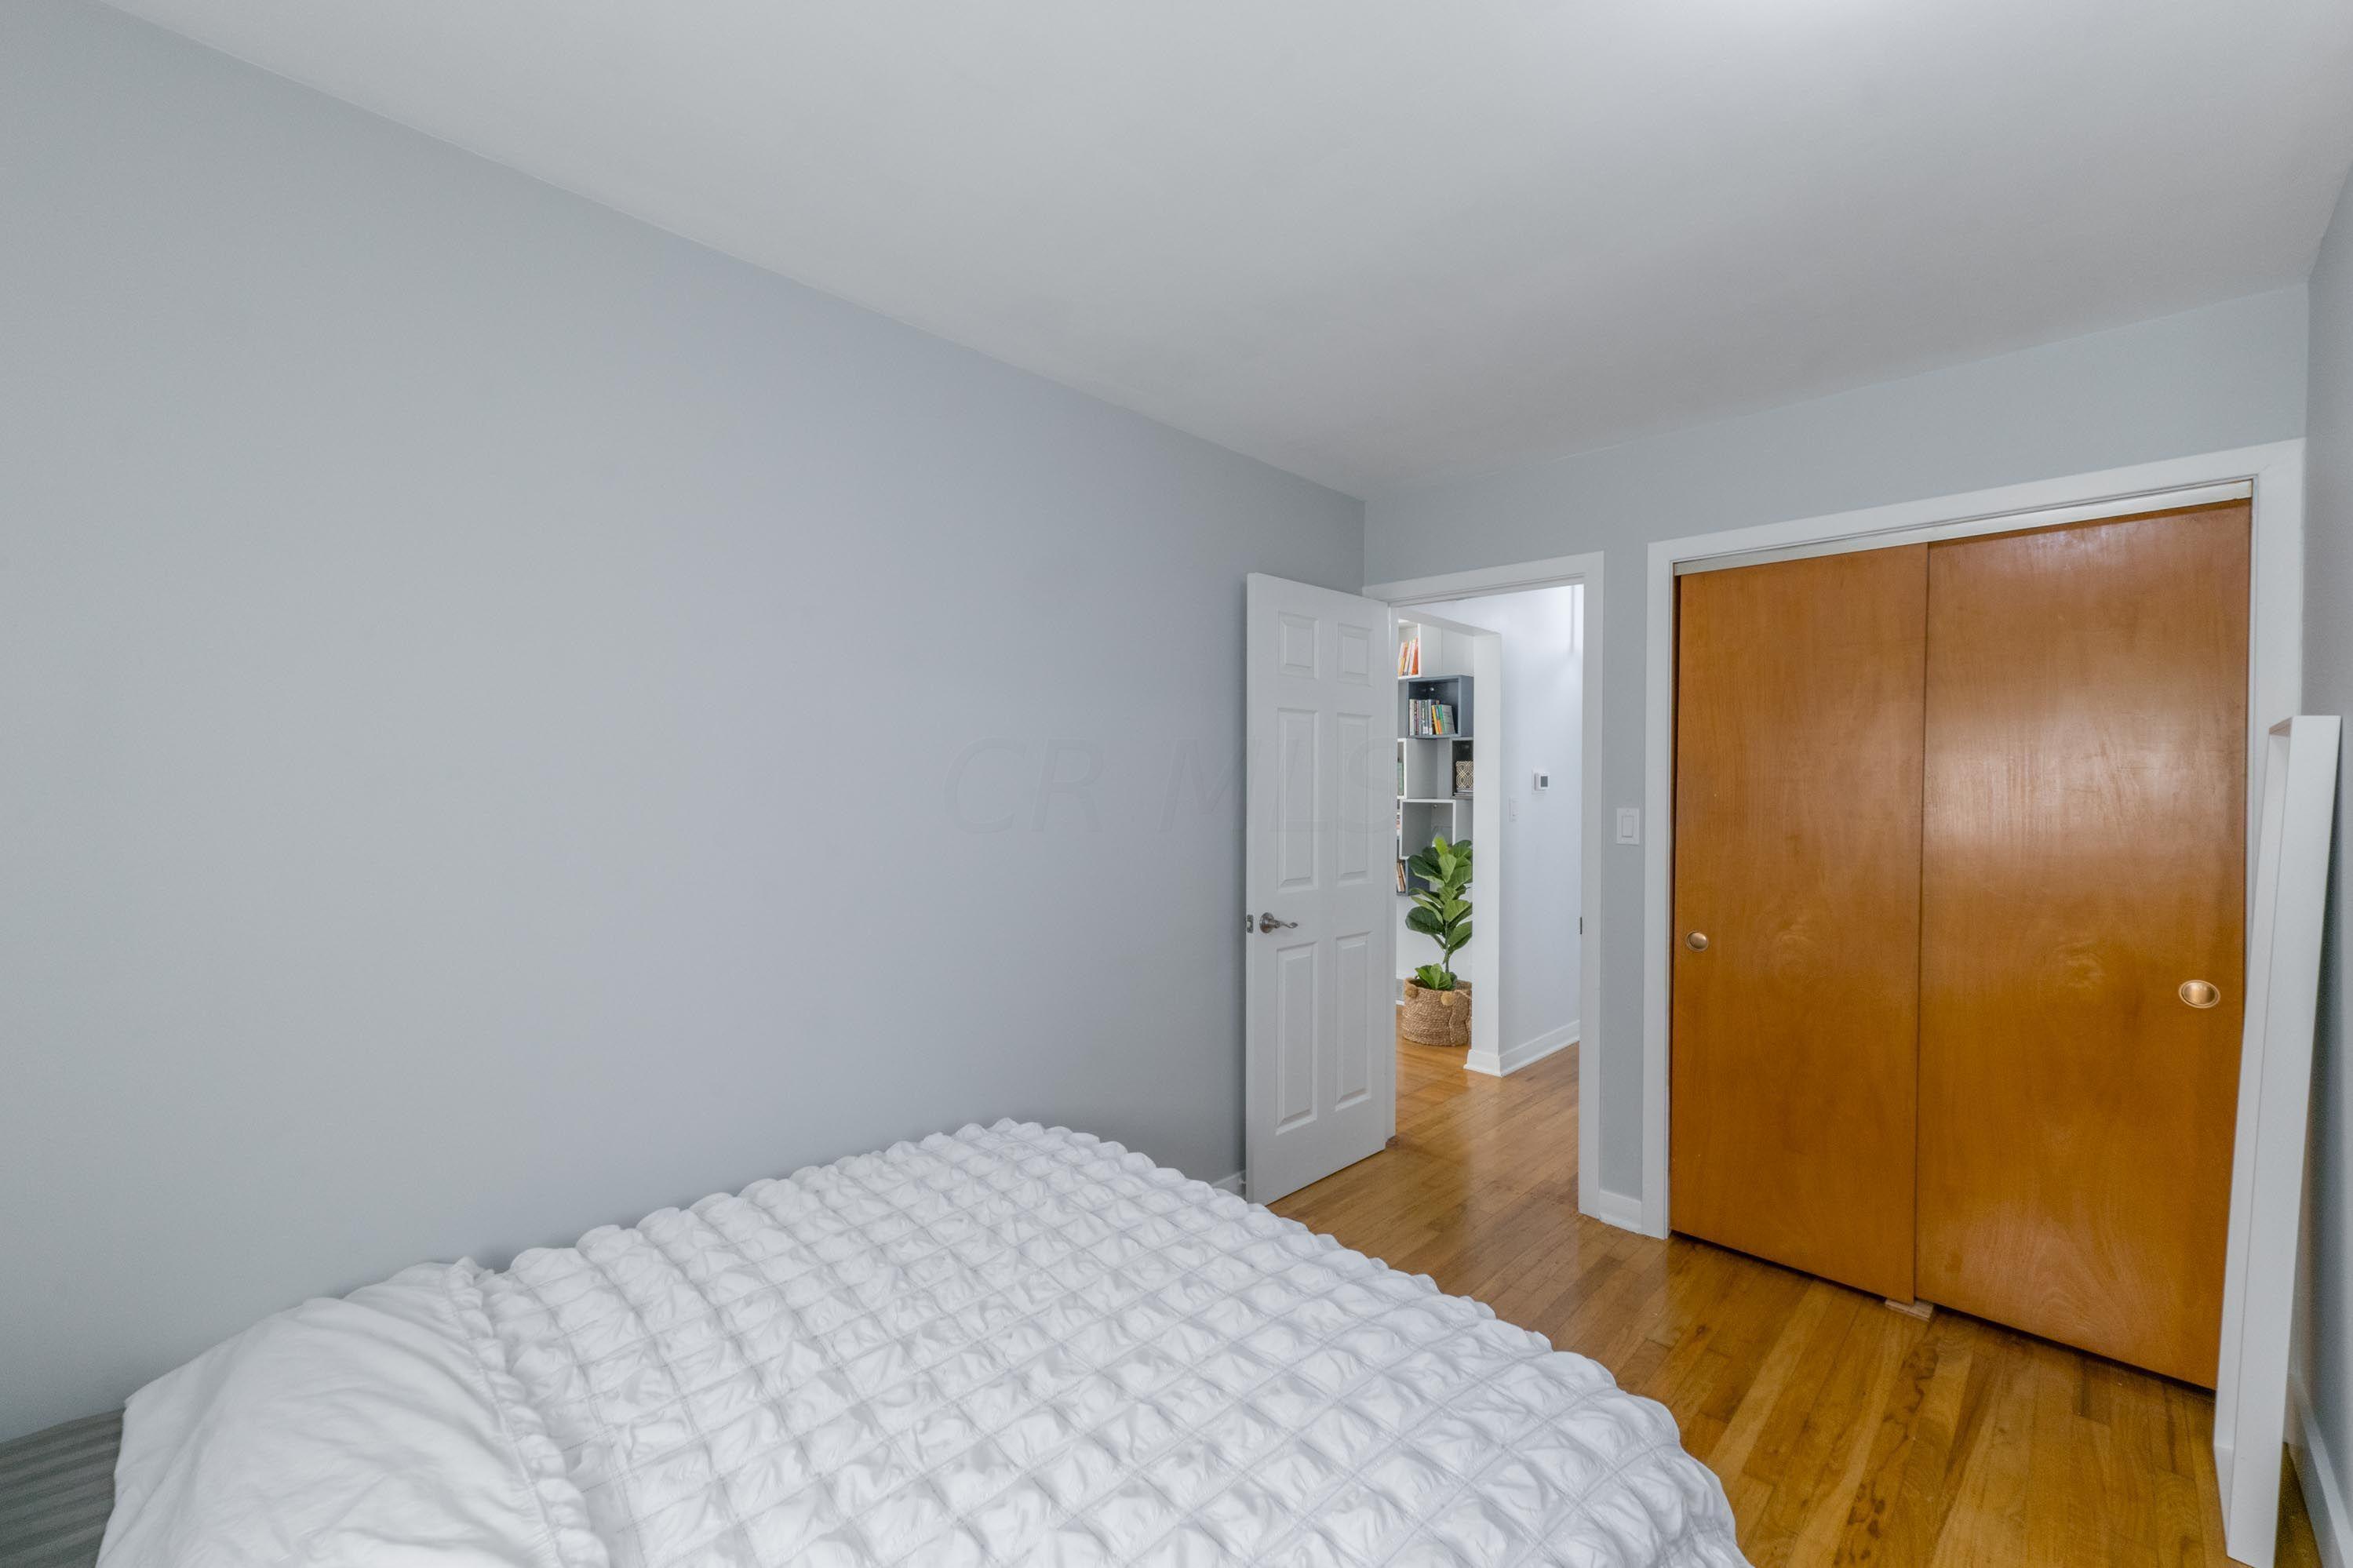 Bedroom - 2 has hardwood floors